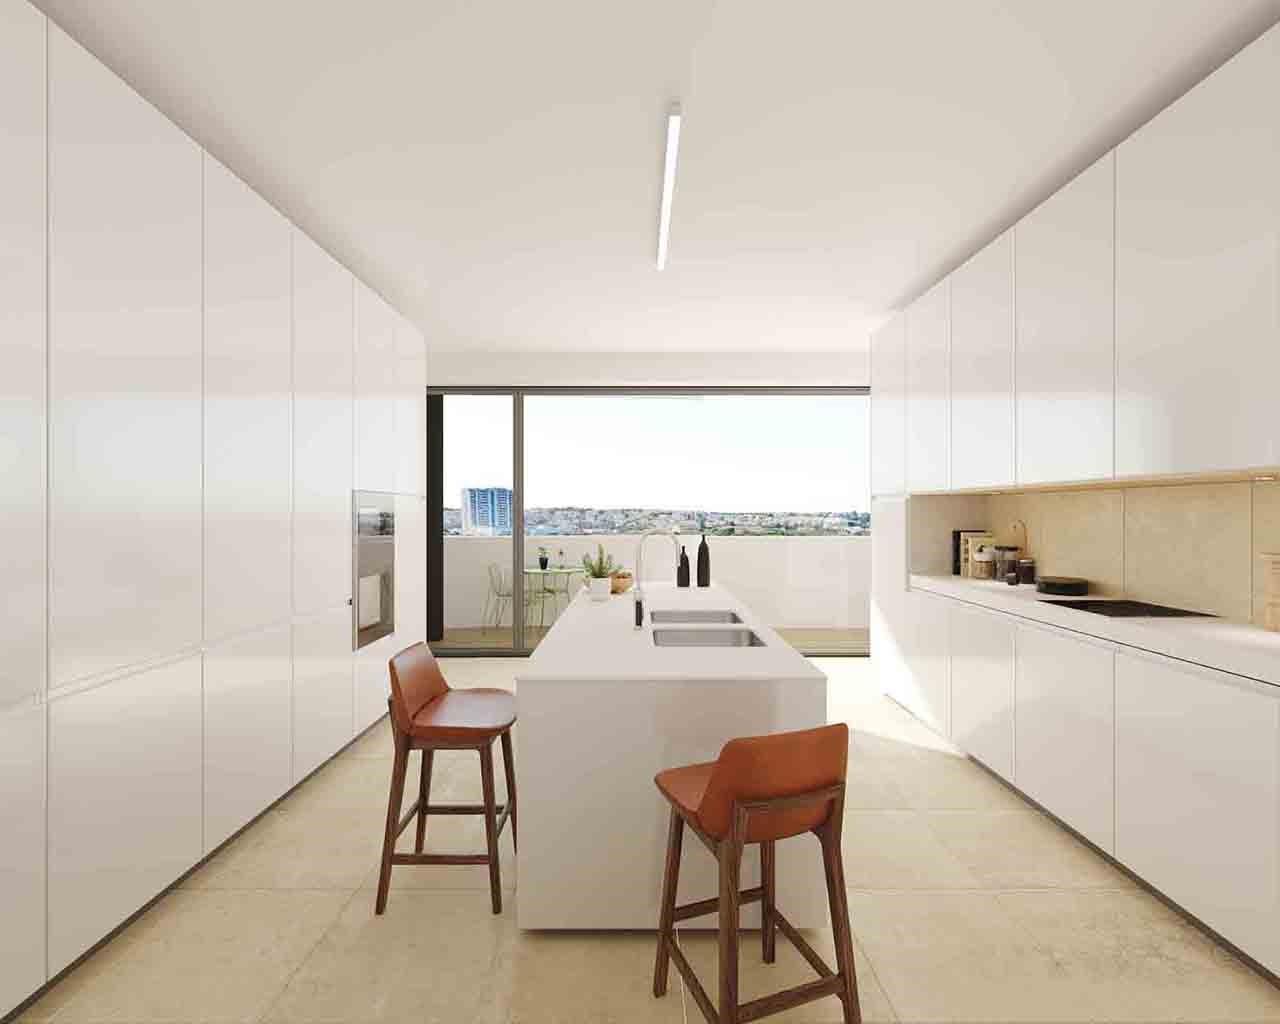 Lux Garden-Cozinha Praia